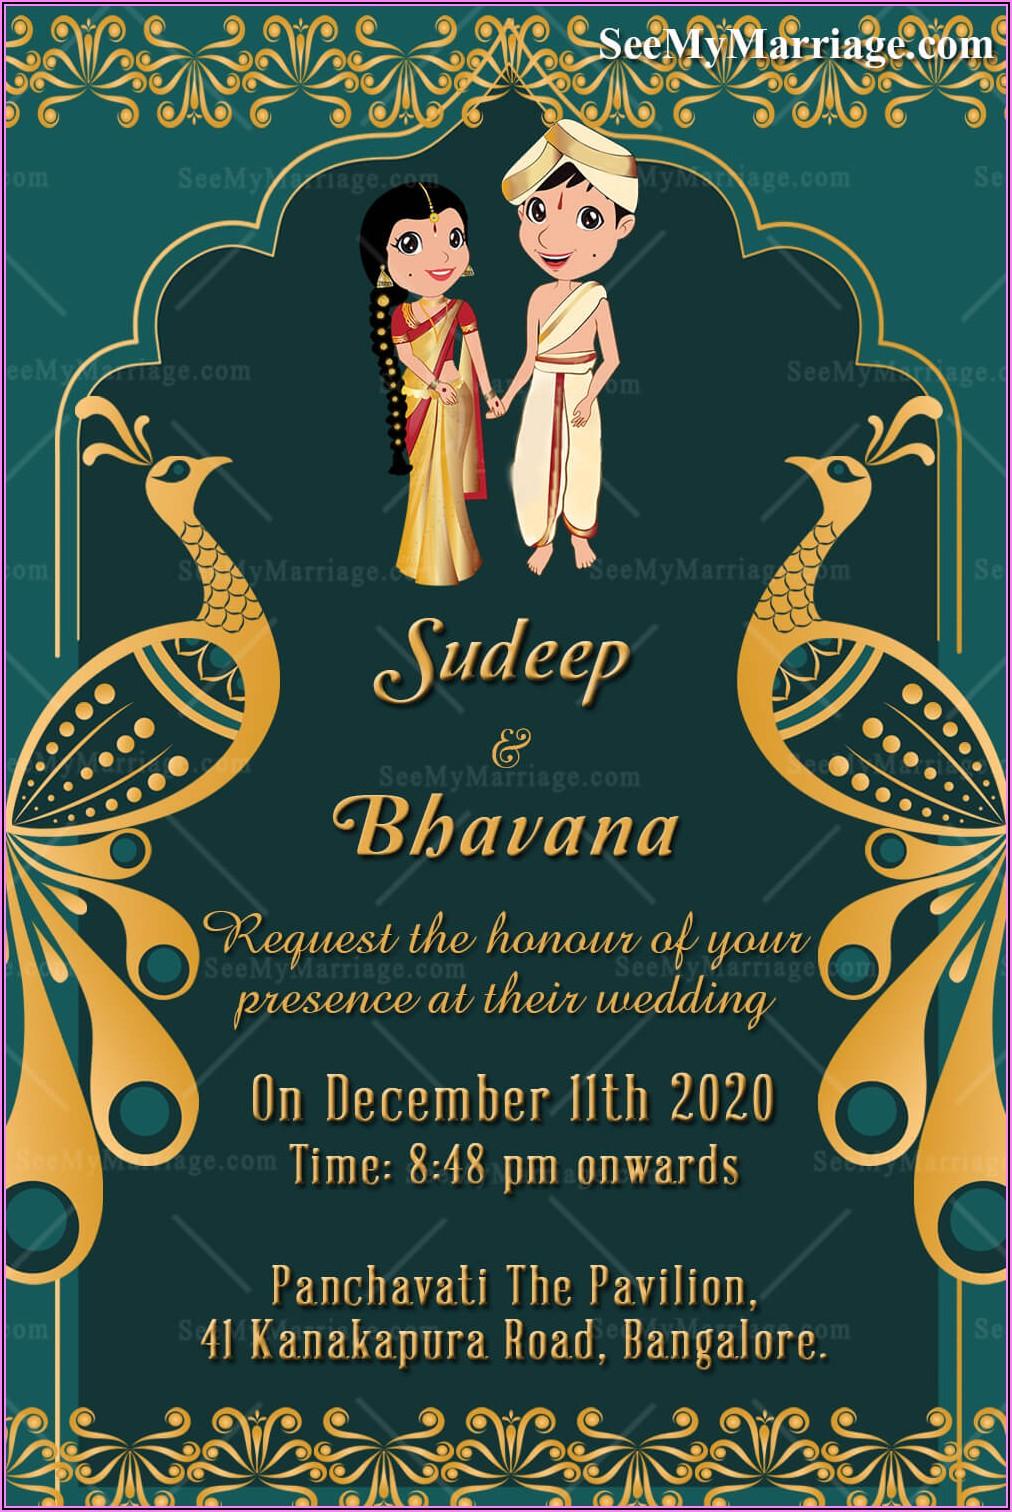 Naming Ceremony Invitation Card In Kannada